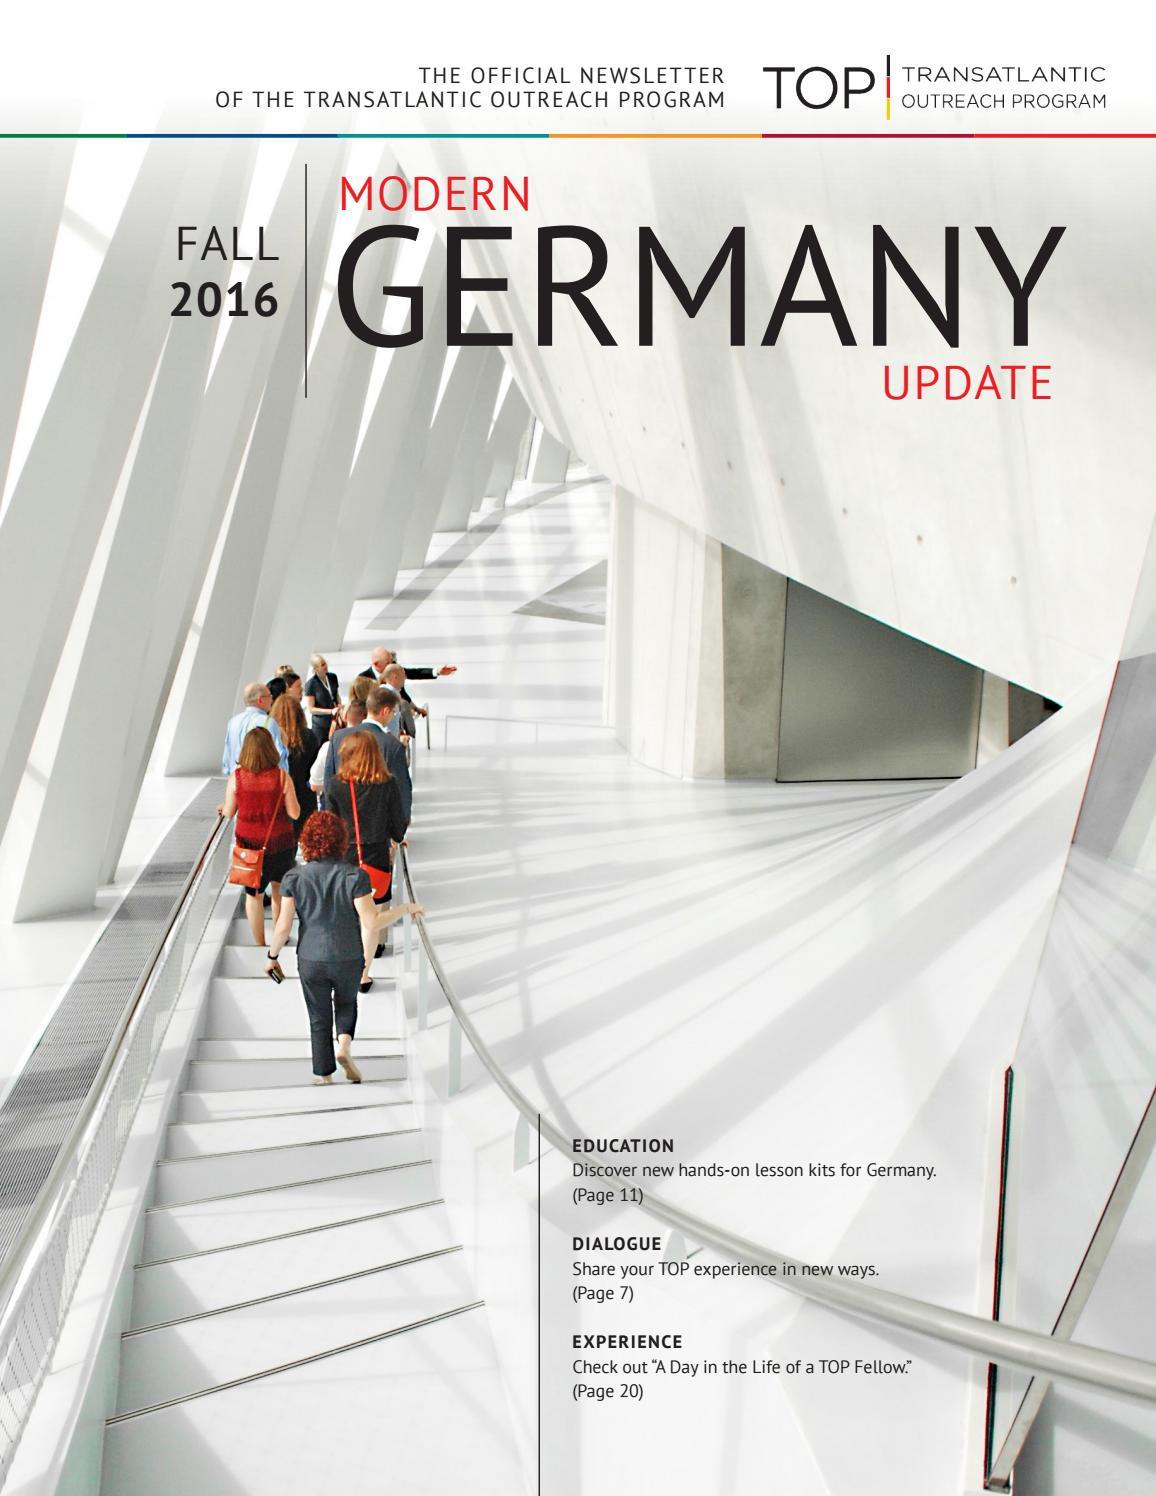 Modern Germany Update 2011 by ransatlantic Outreach Program - issuu - ^